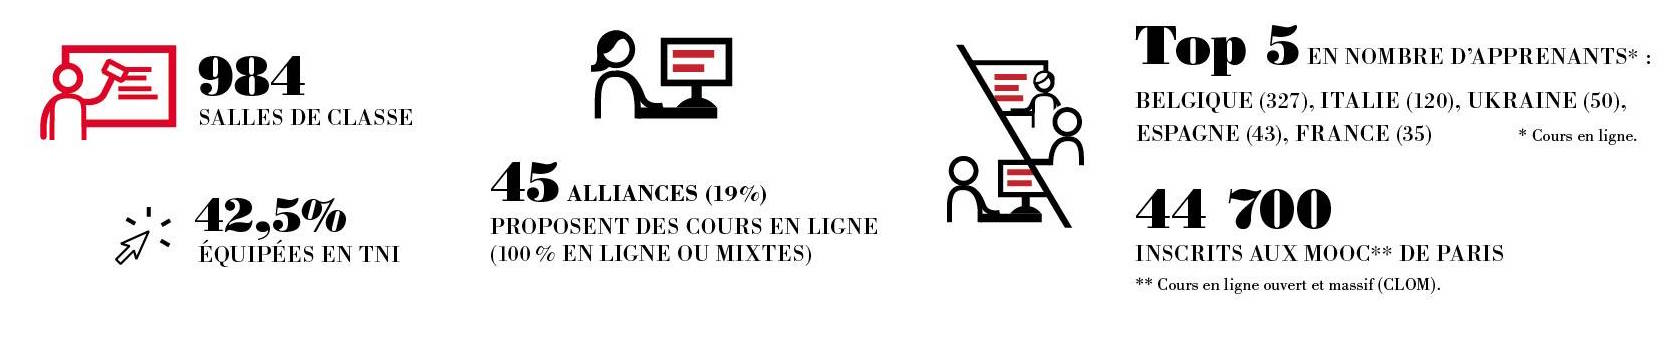 numerique-alliances-francaises-europe